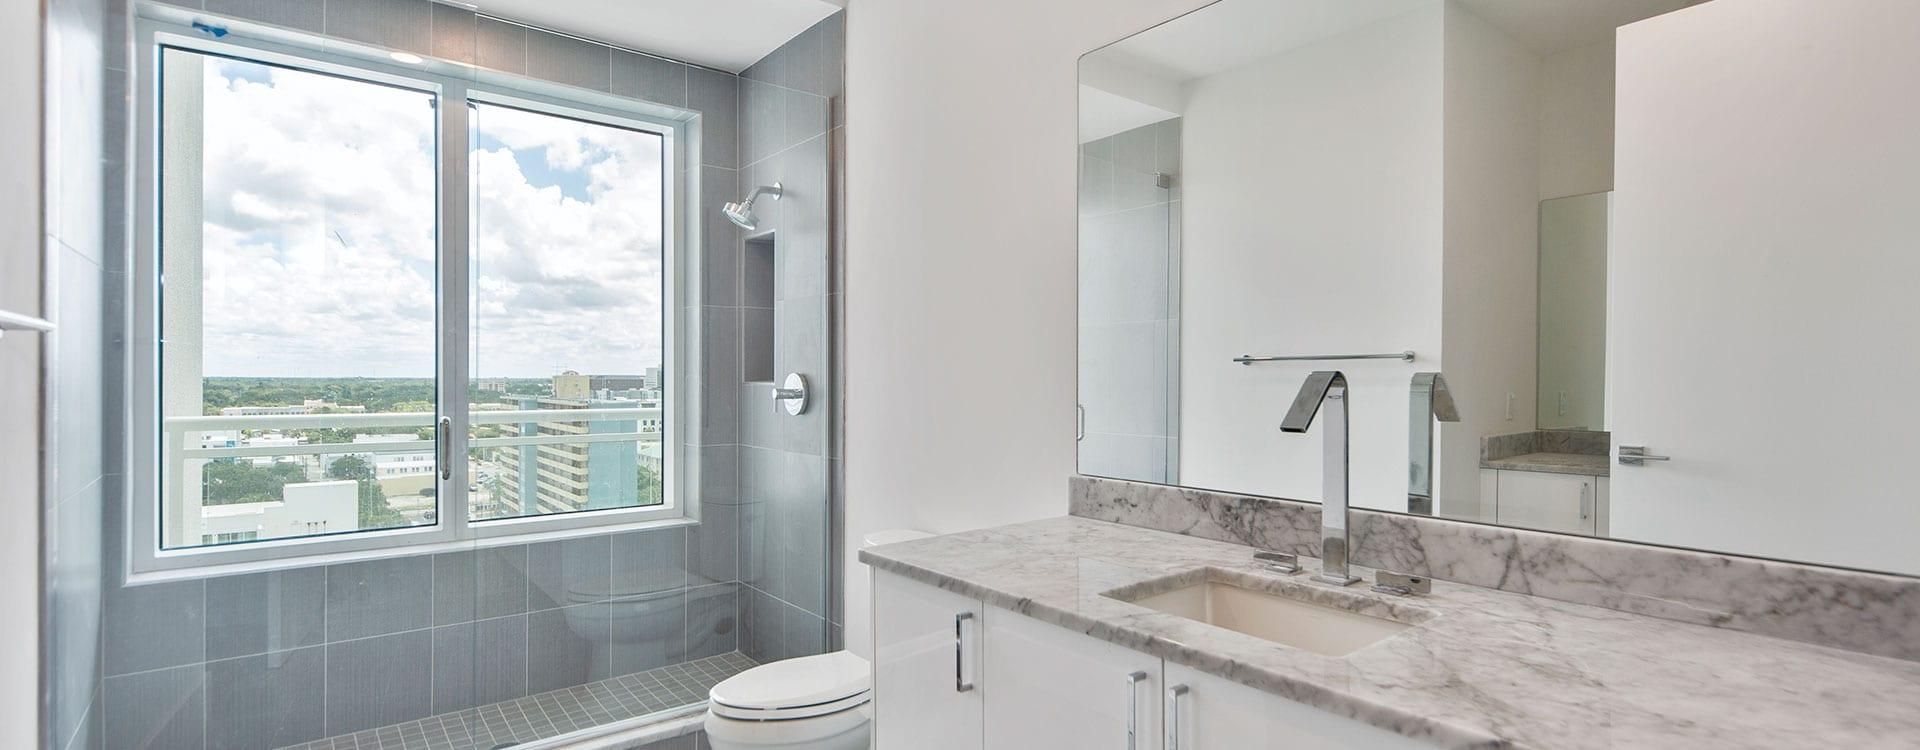 BLVD Sarasota Residence 1102 Bathroom with a view